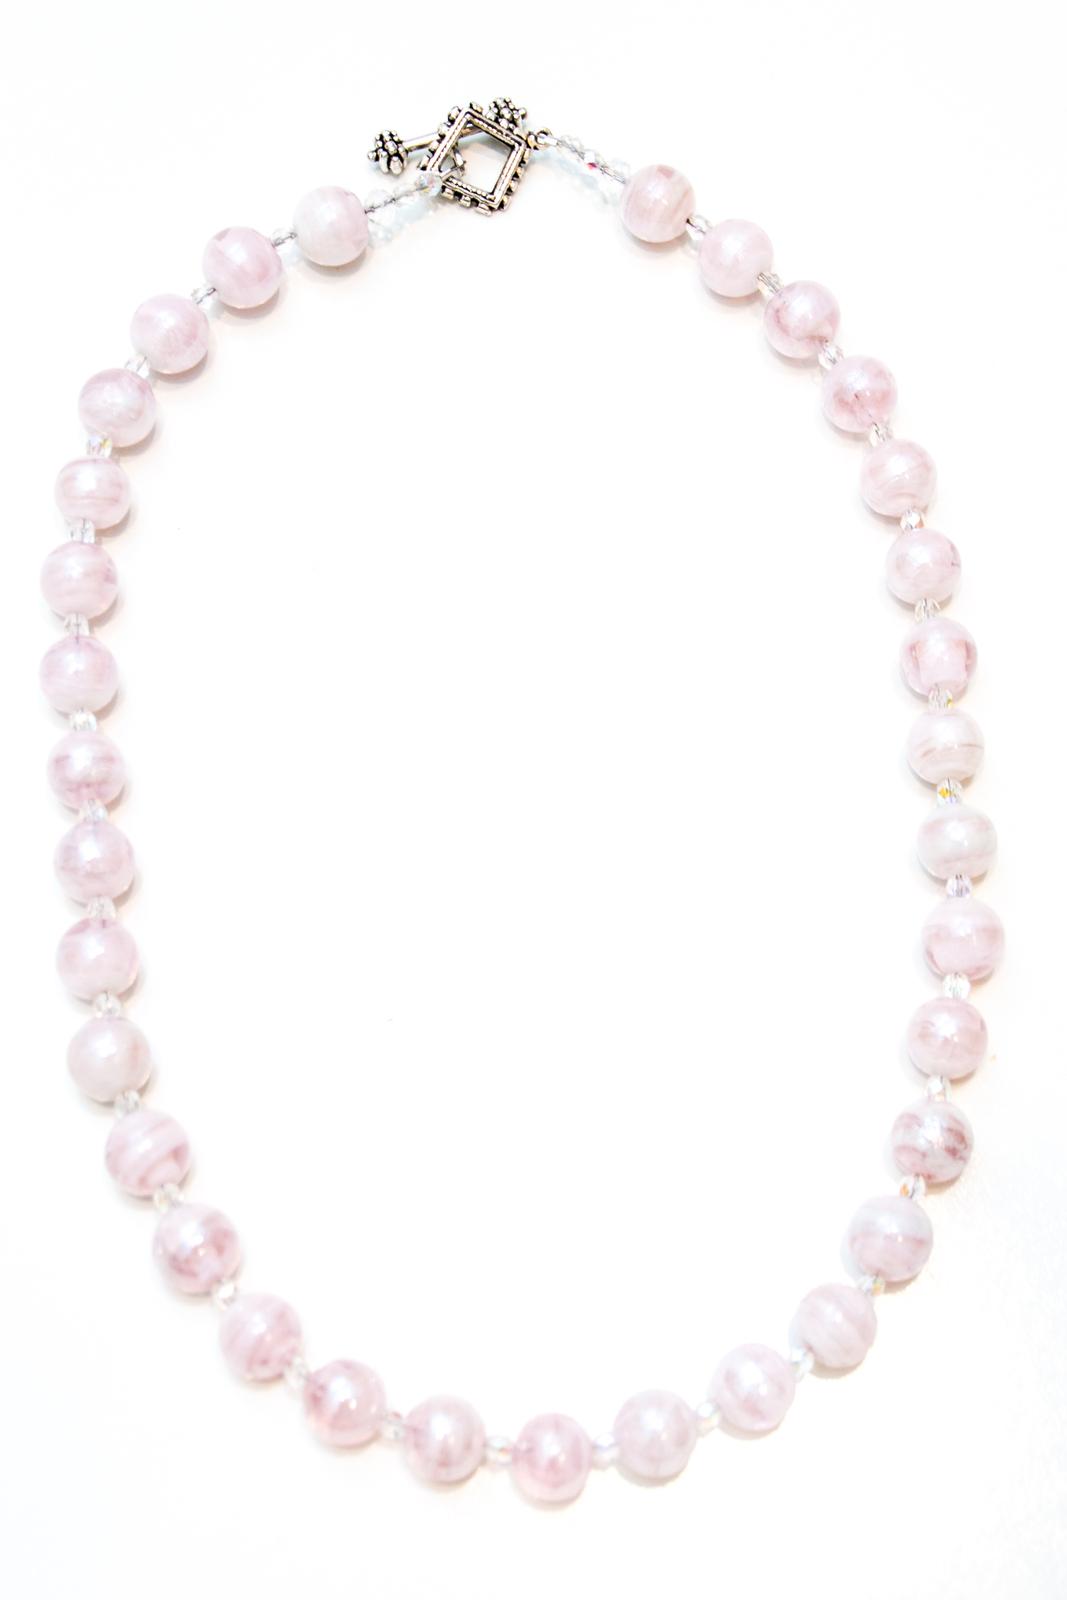 doorheart jewelry icy pink necklace necklaces pendants